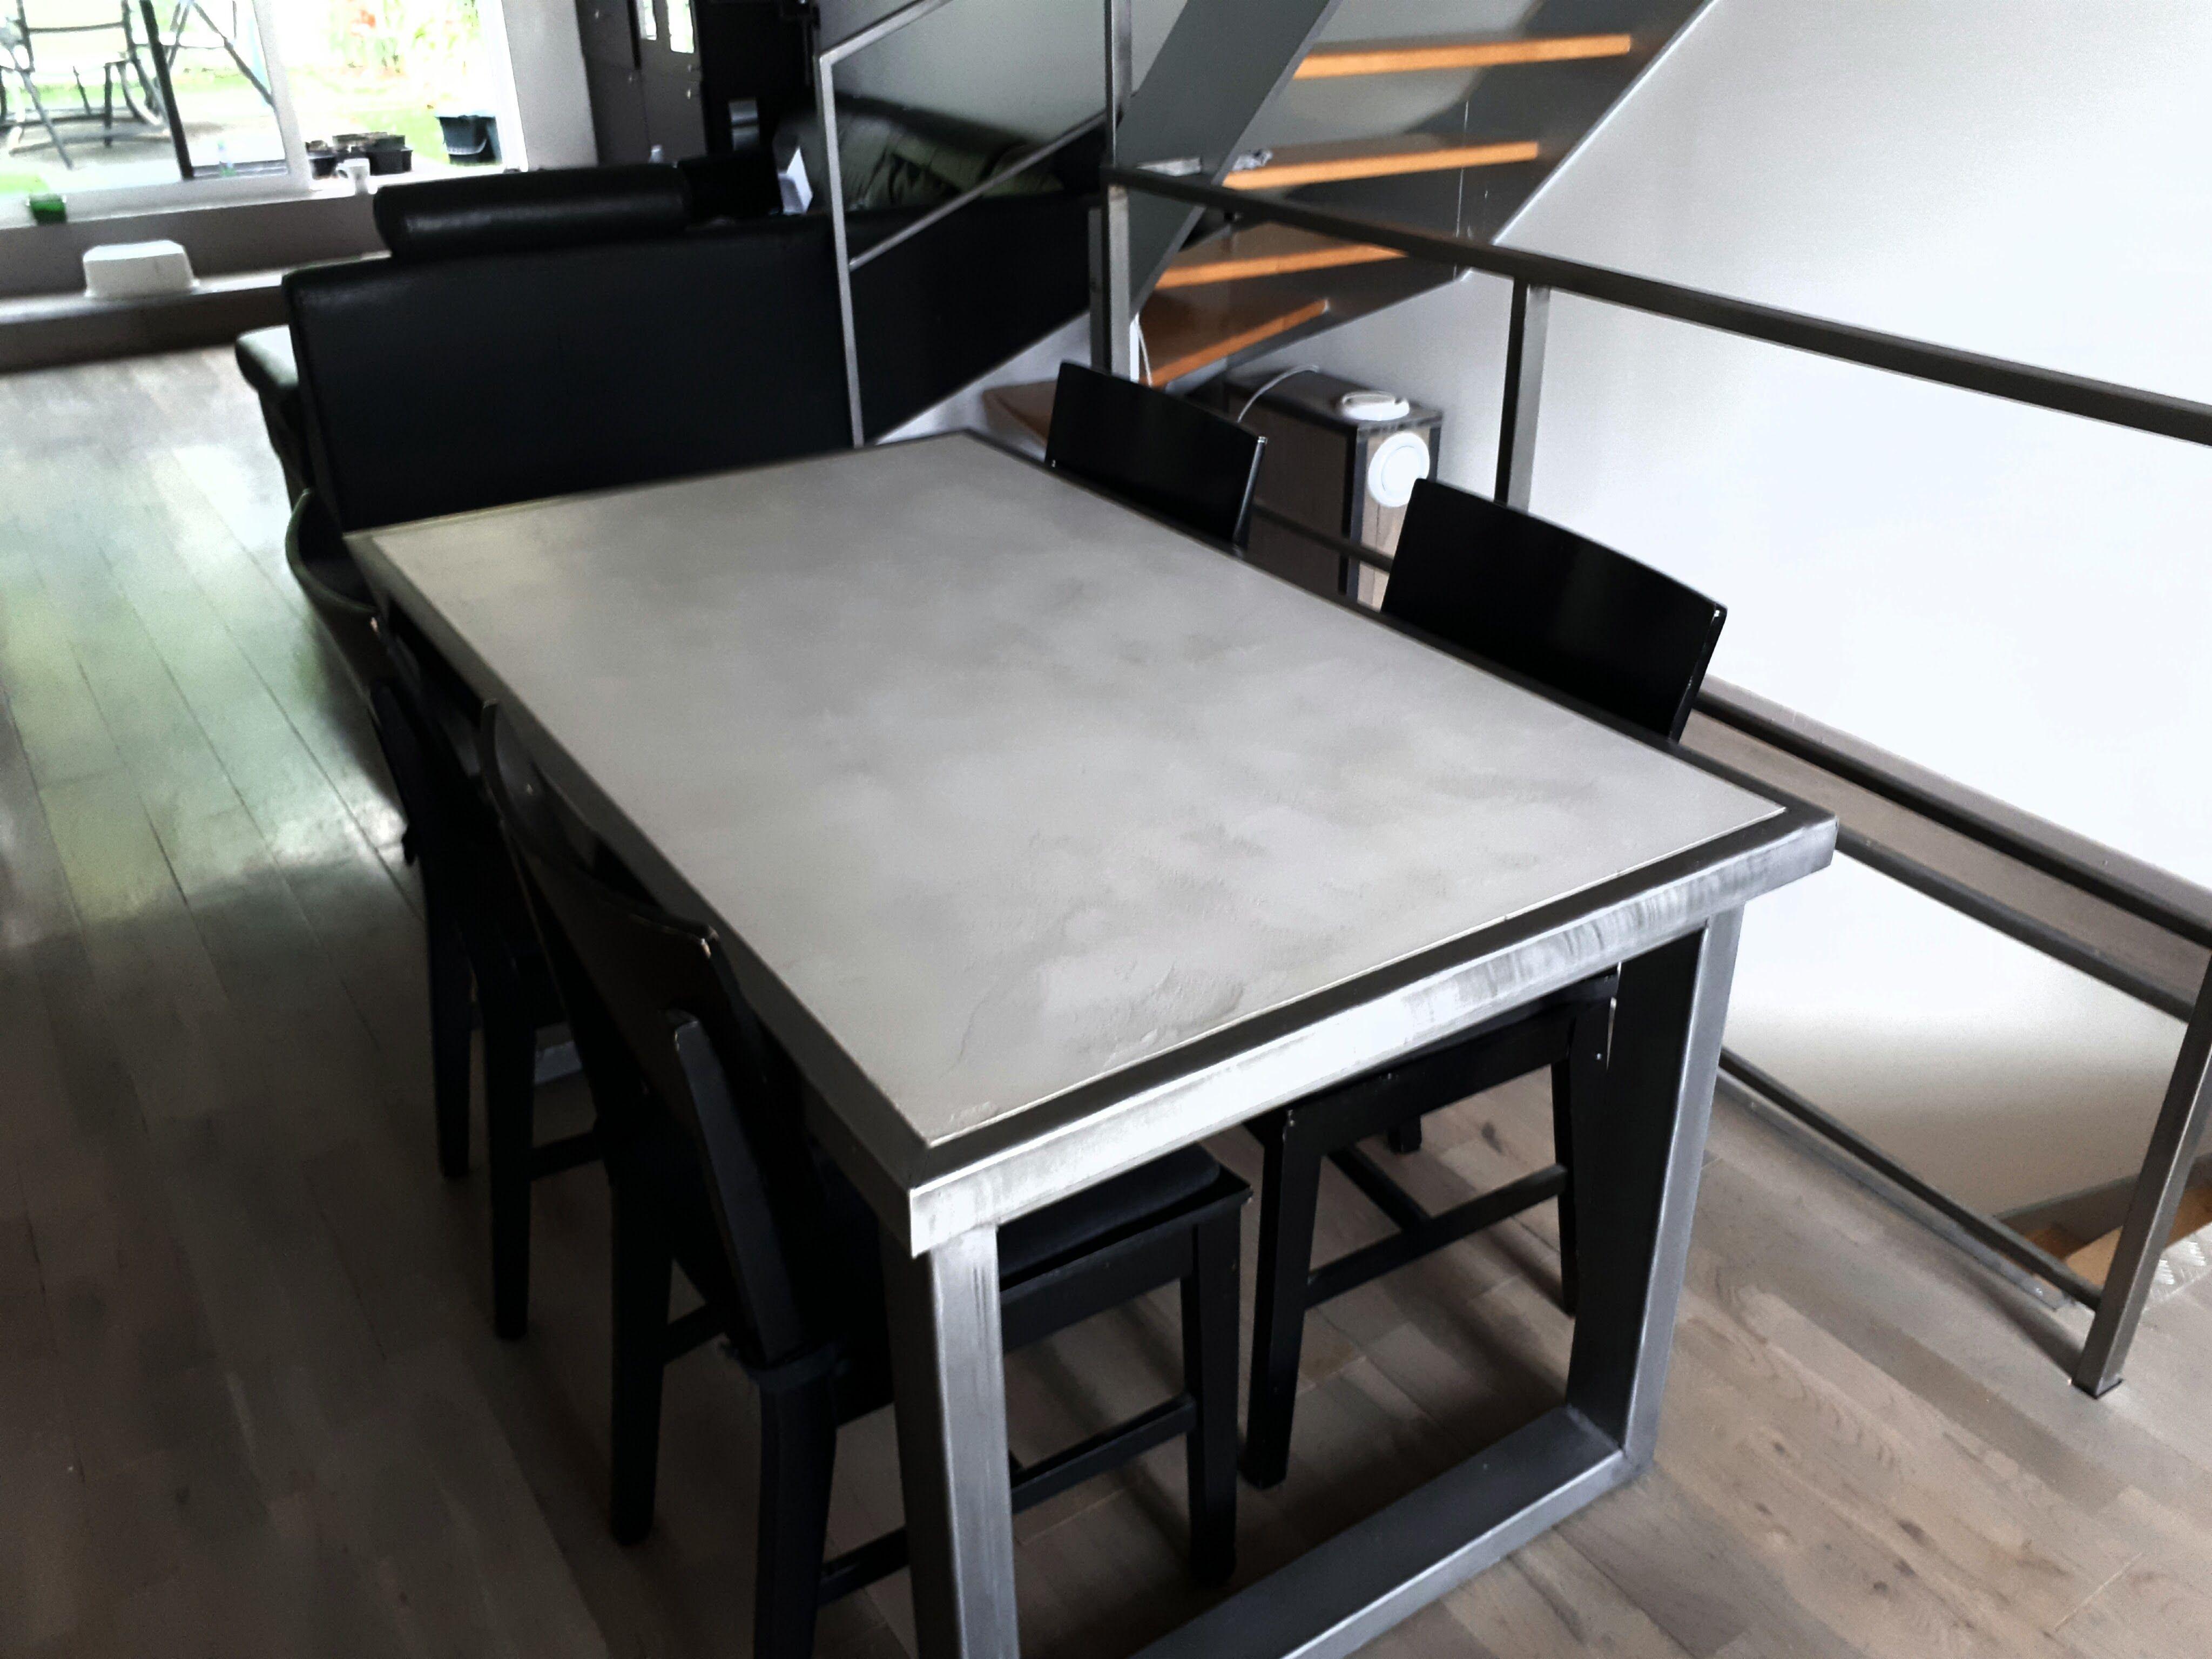 diy table salon indus metal beton cire (steel / concrete table